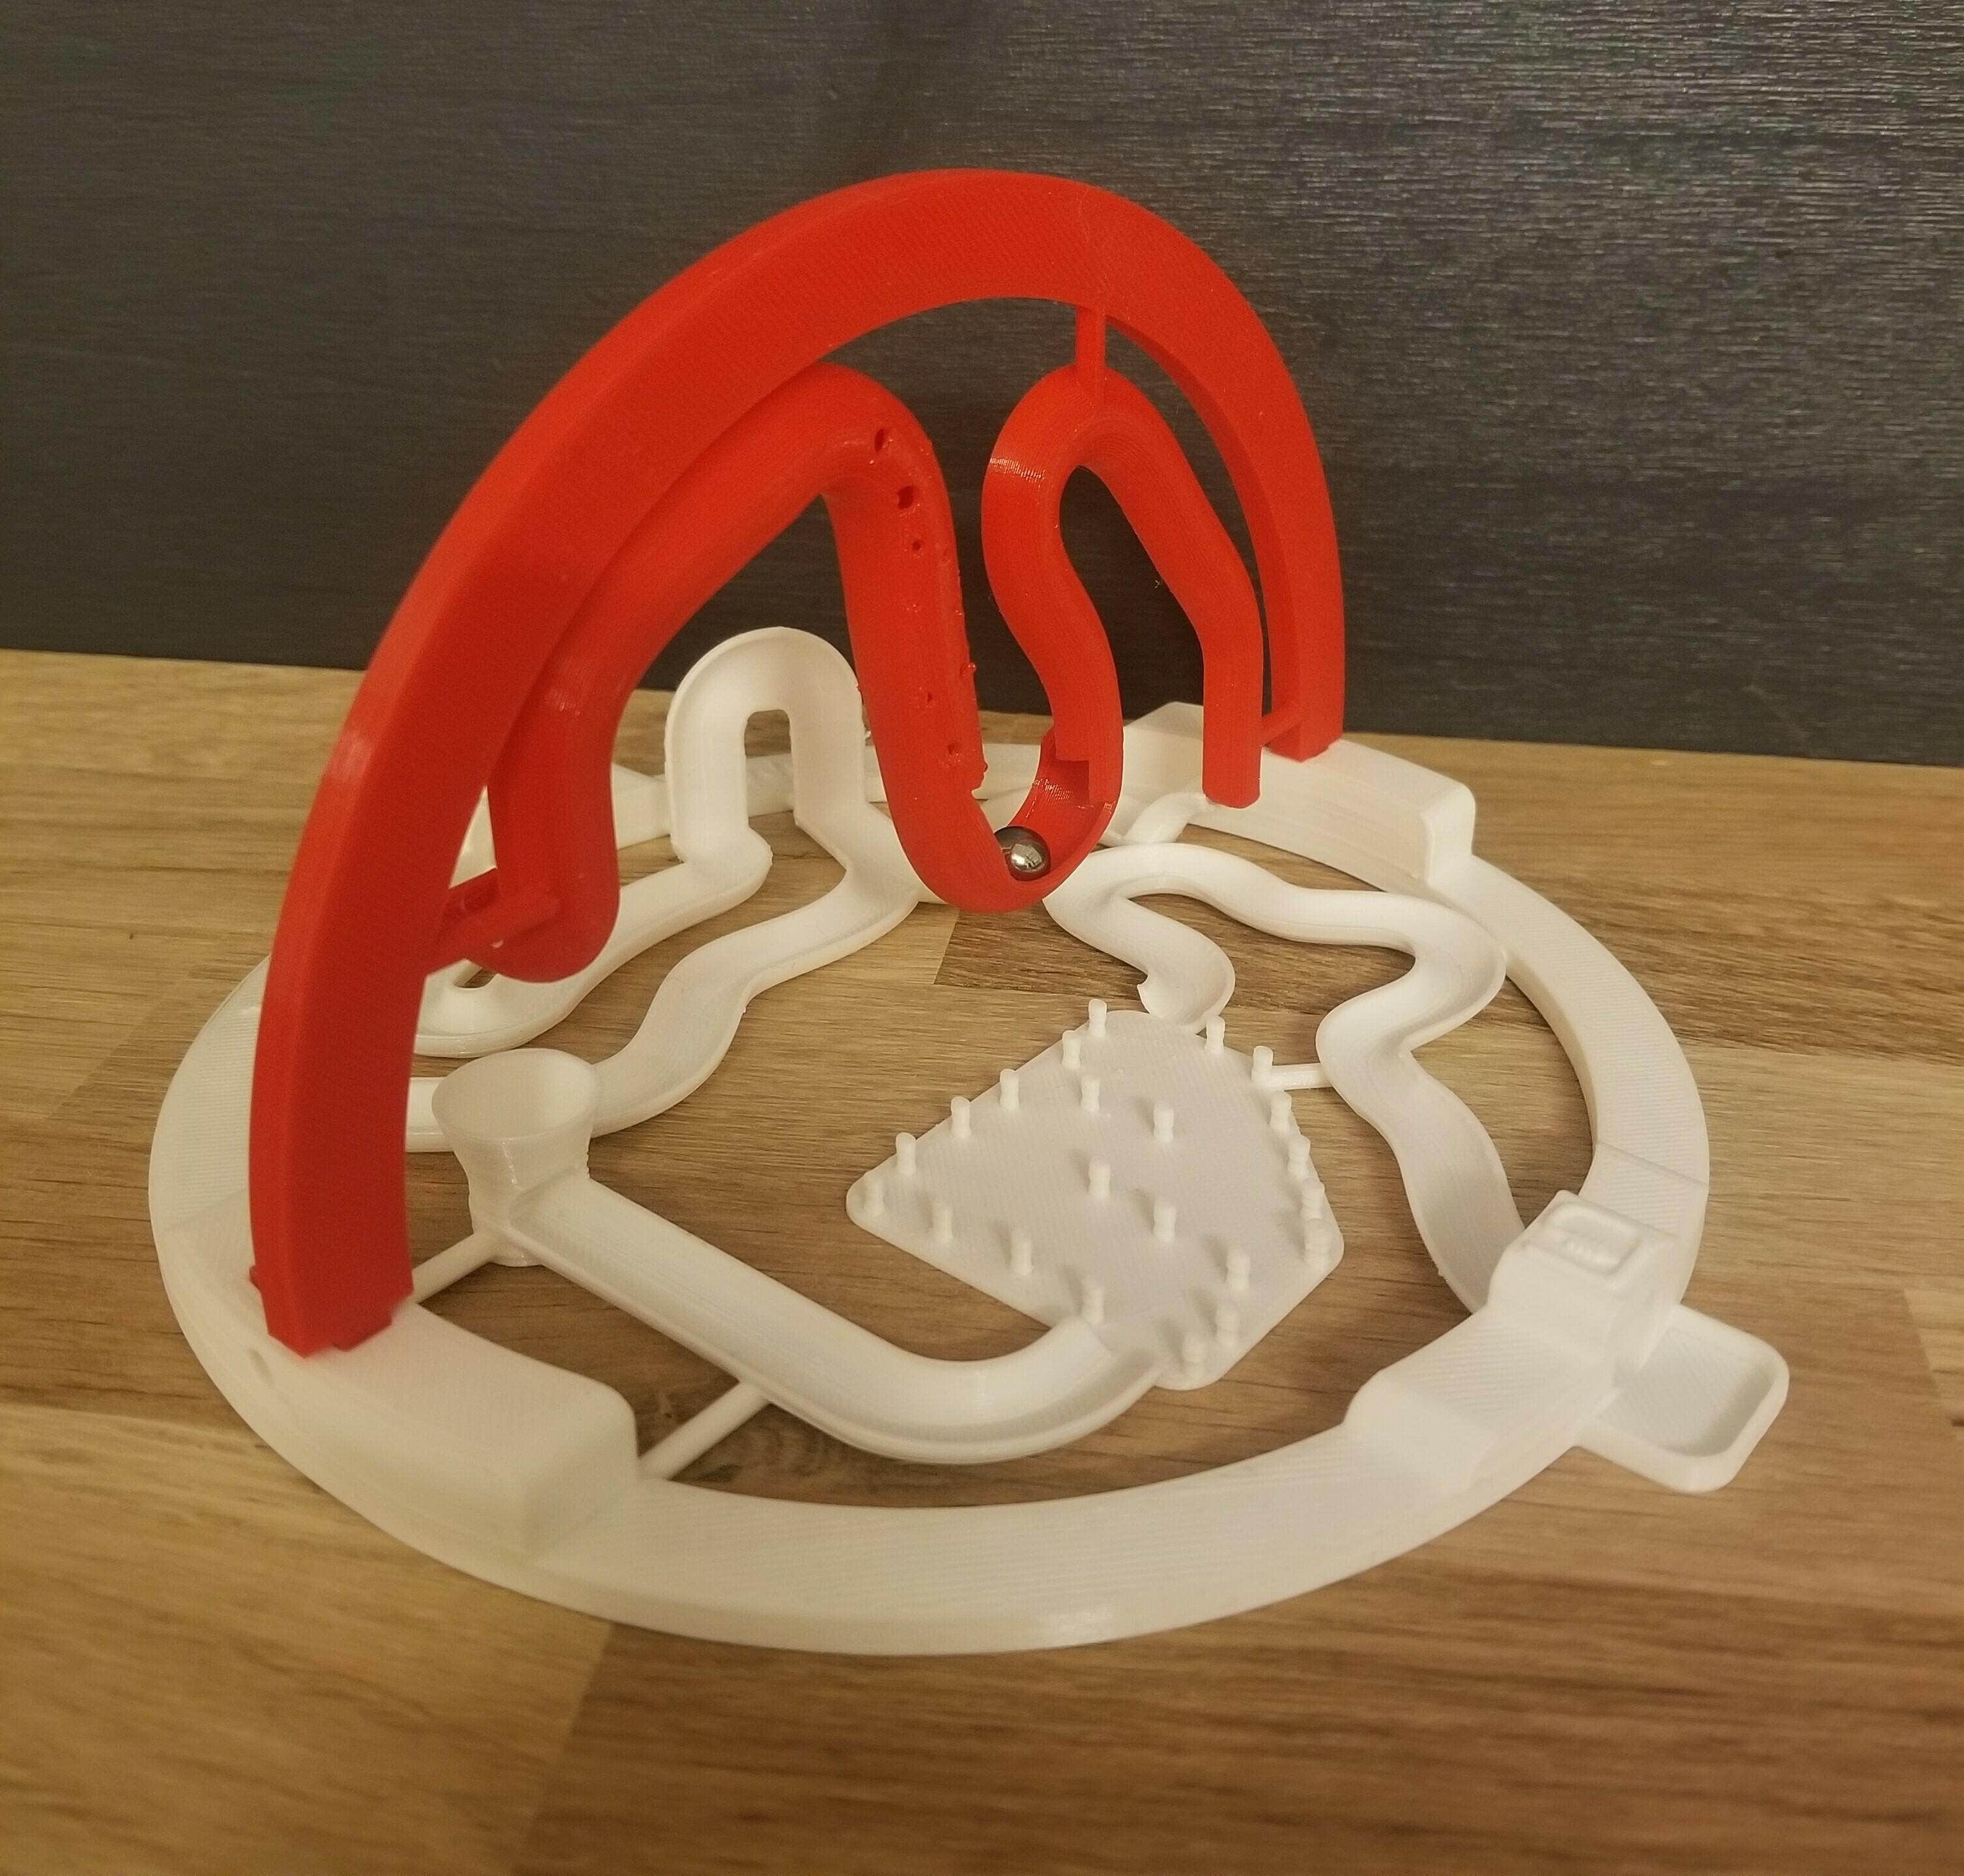 20201220_190056.jpg Download STL file 3D ball course • 3D printer template, LouD3D